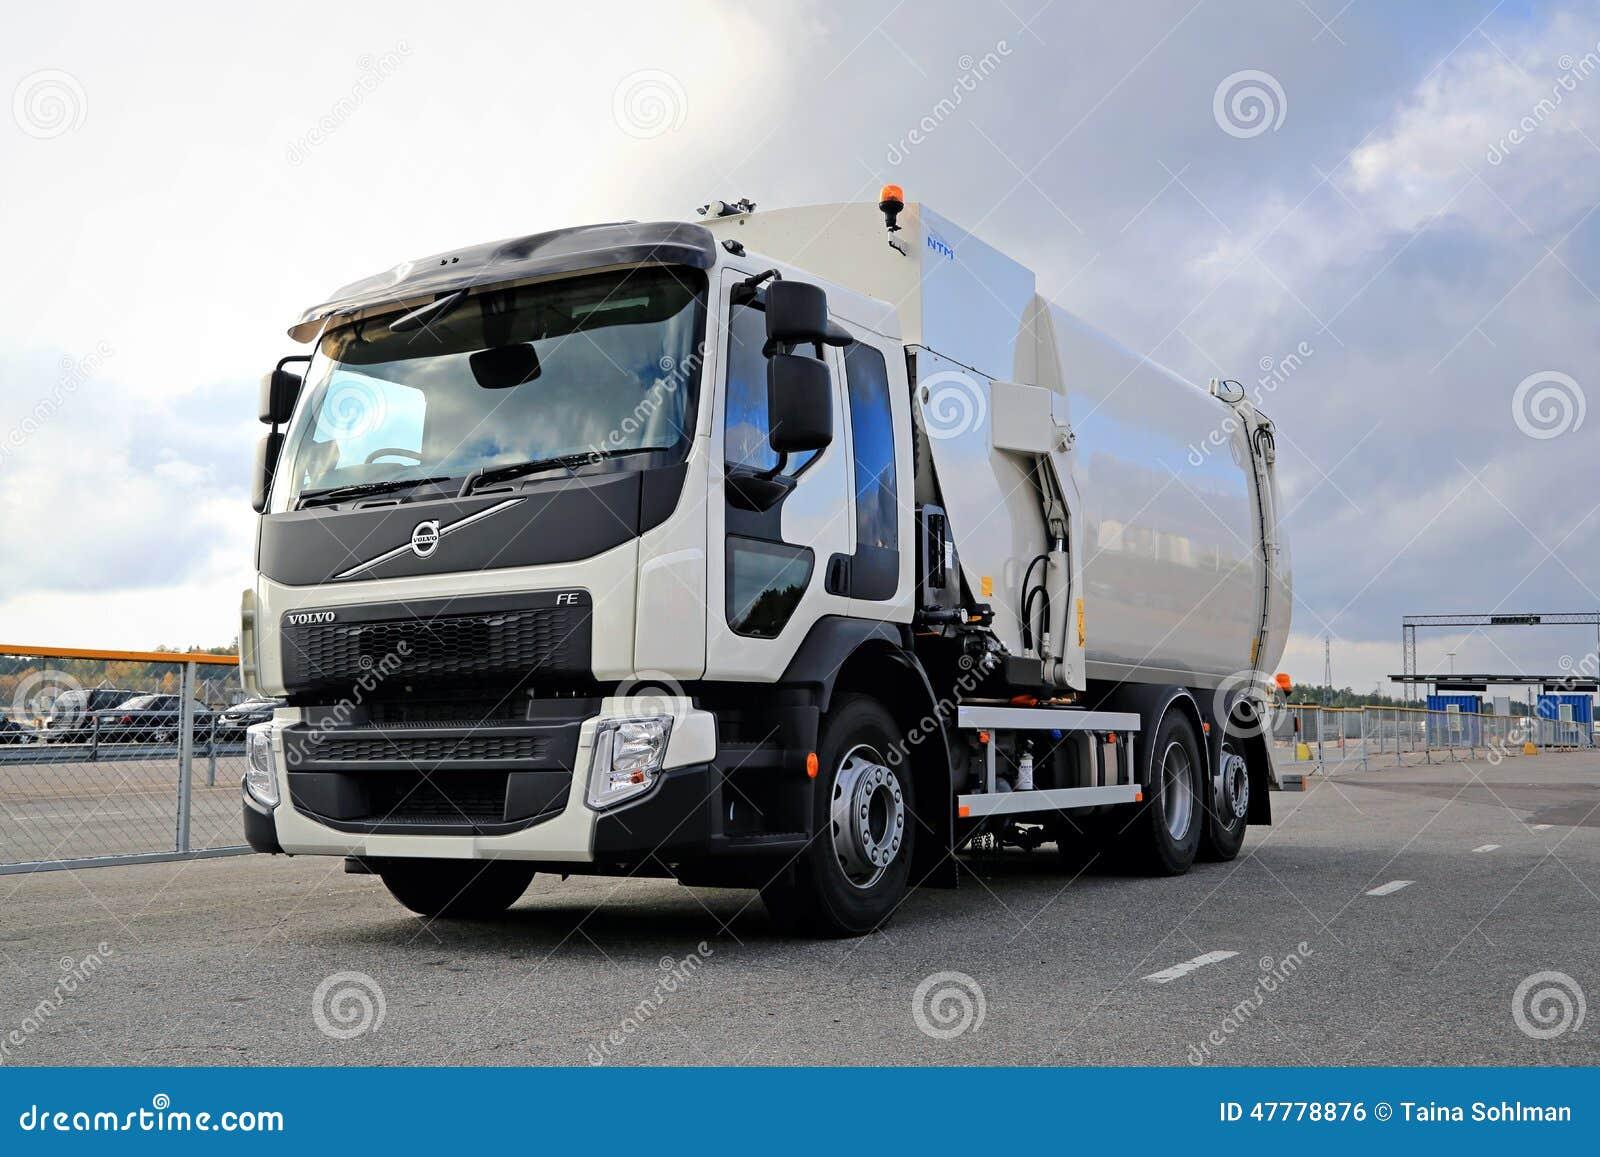 White Volvo FE Refuse Collector Truck. NAANTALI, FINLAND   OCTOBER 11, 2014: